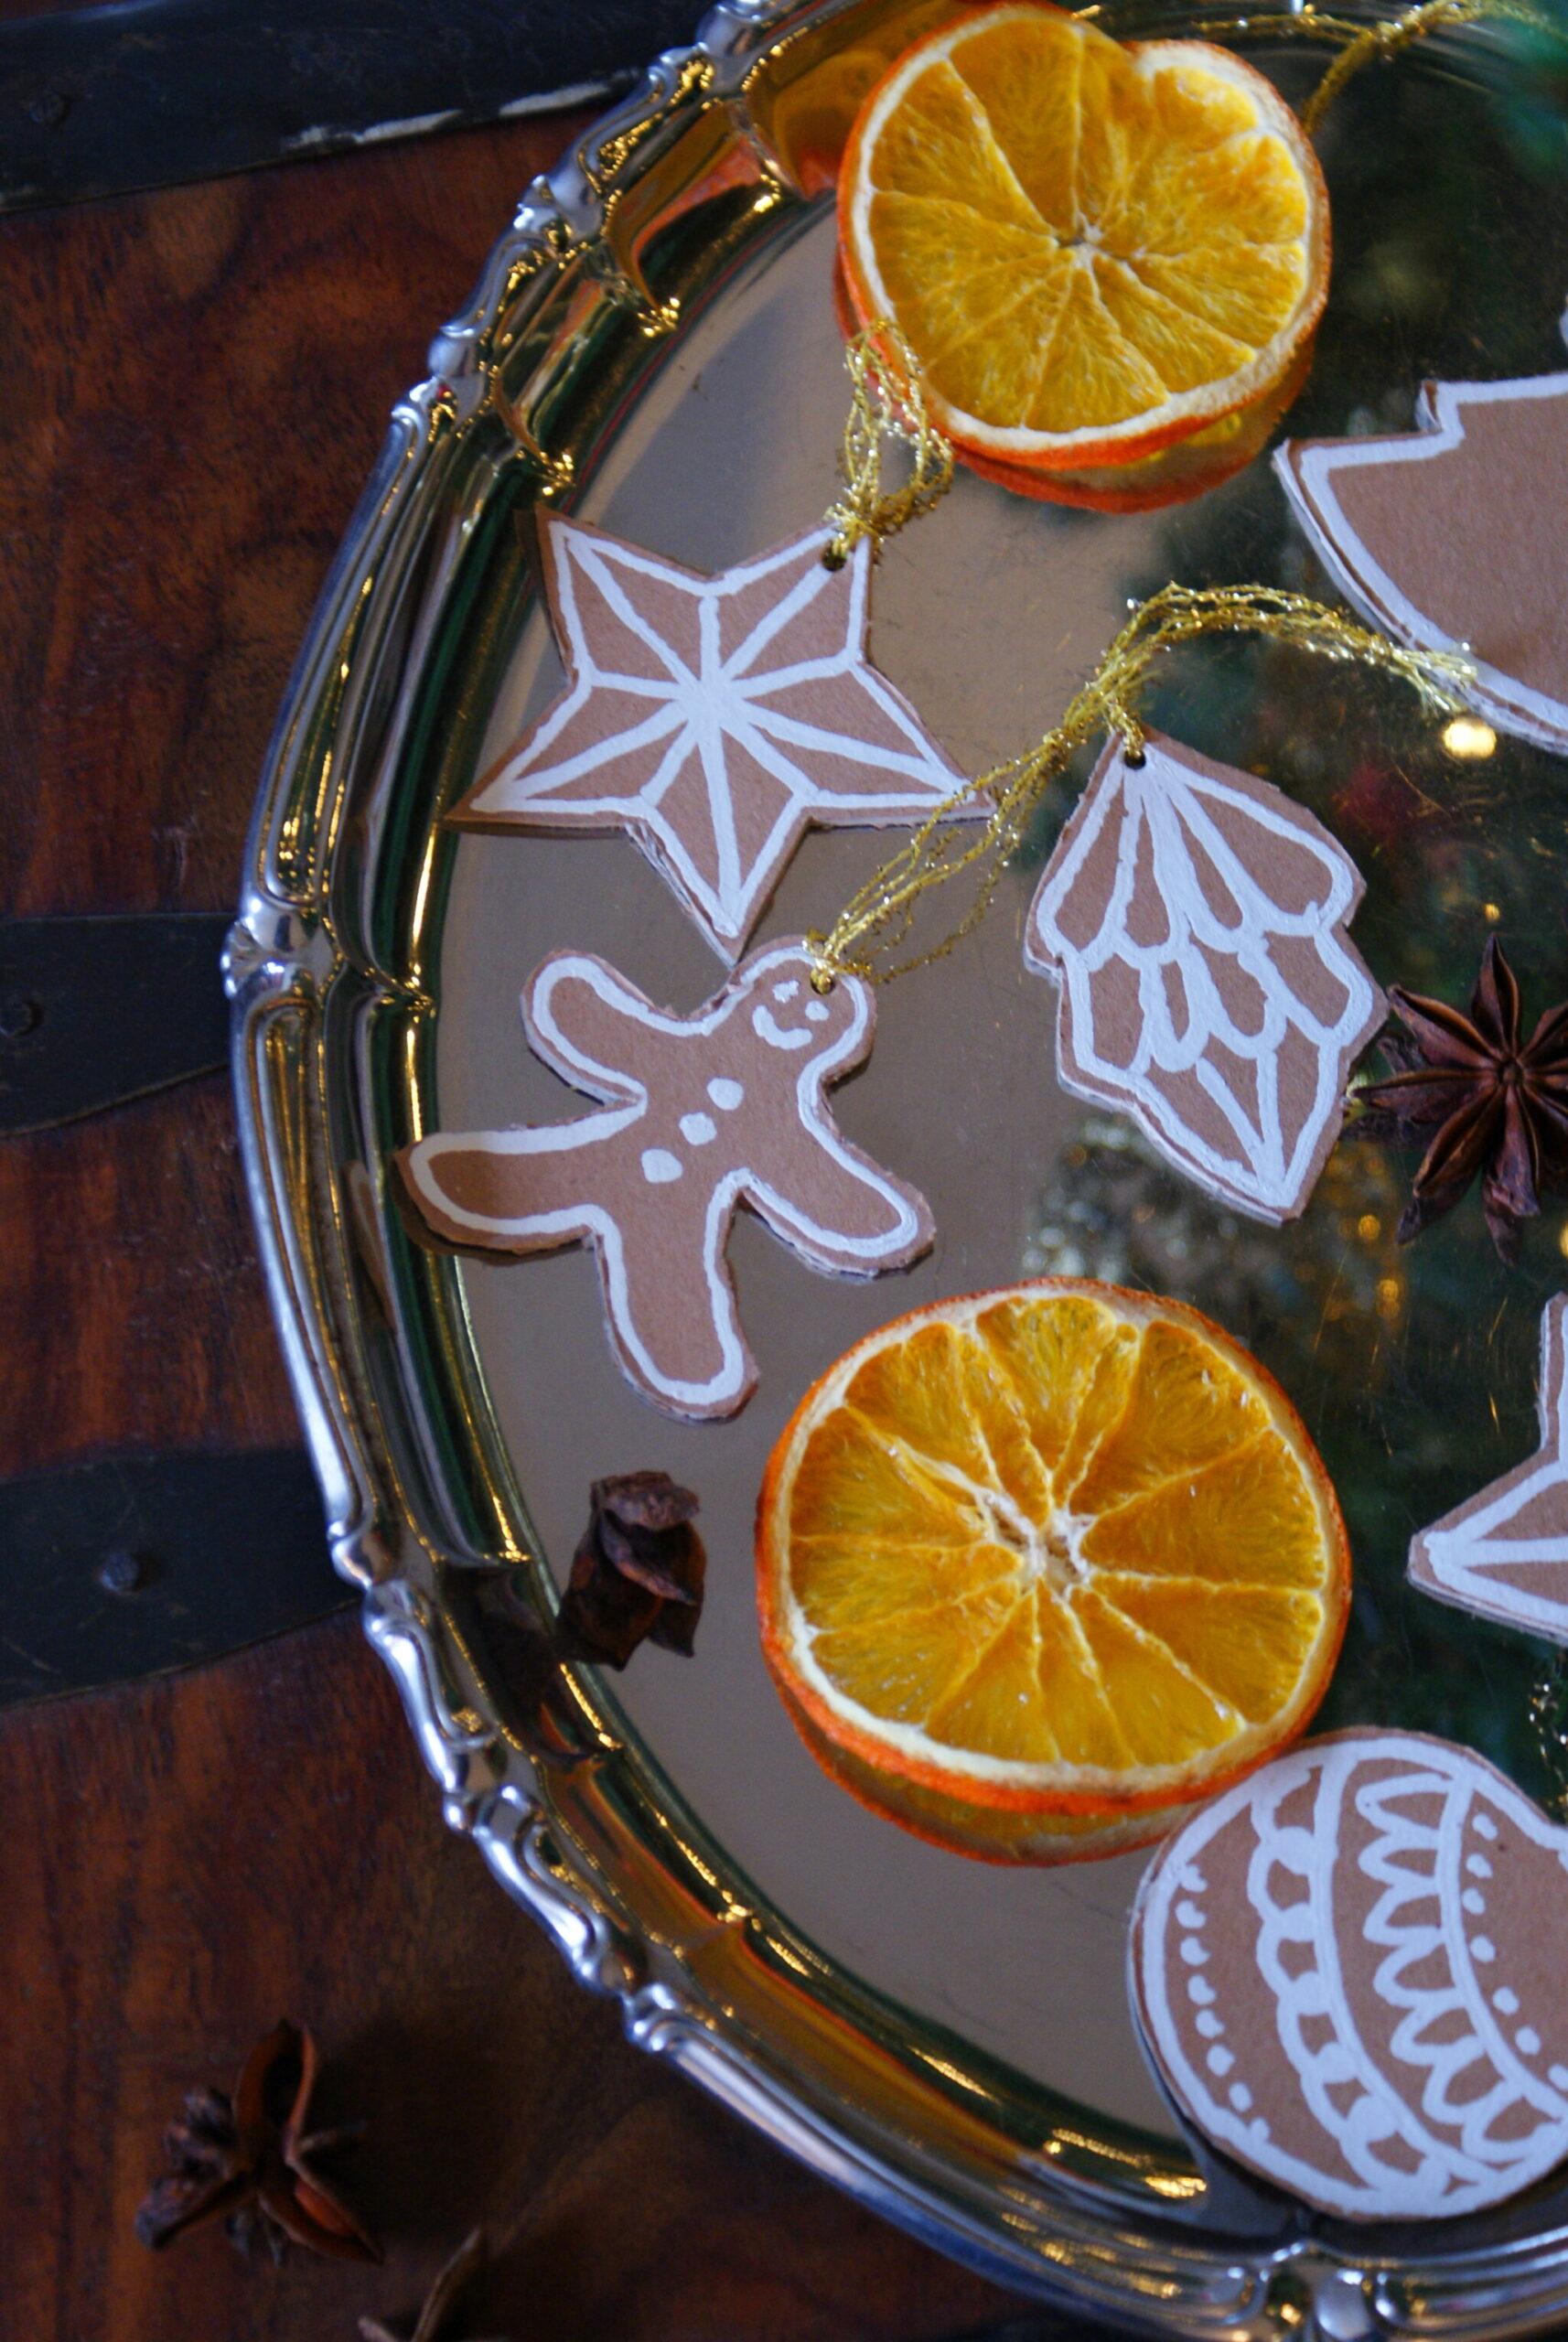 diy cardboard gingerbread cookies christmas tree ornaments idea easy last minute francinesplaceblog simple